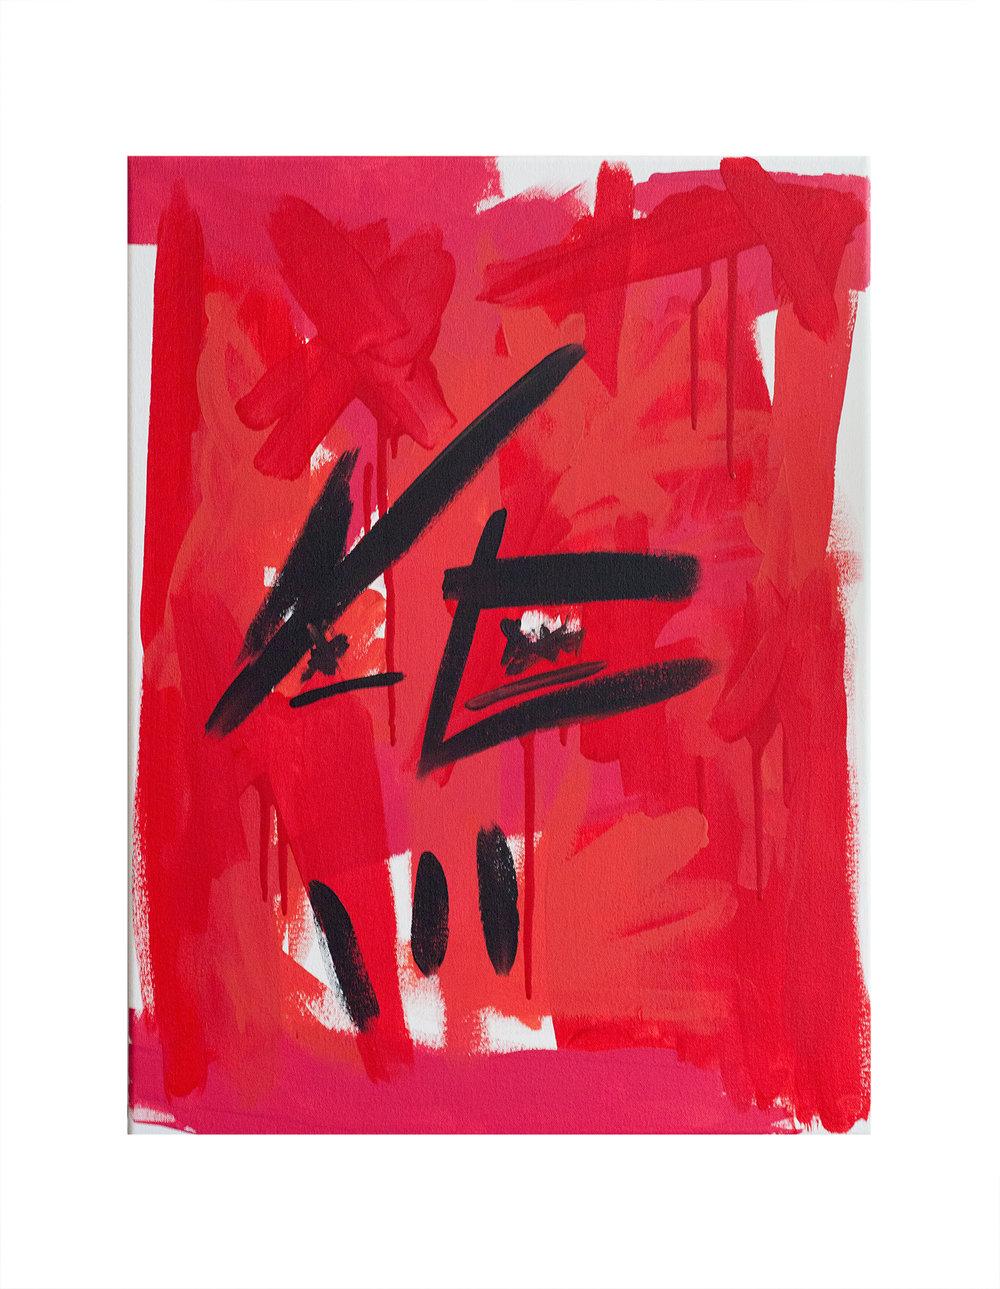 "True Love Acrylic on canvas 18"" x 24"" 2018"